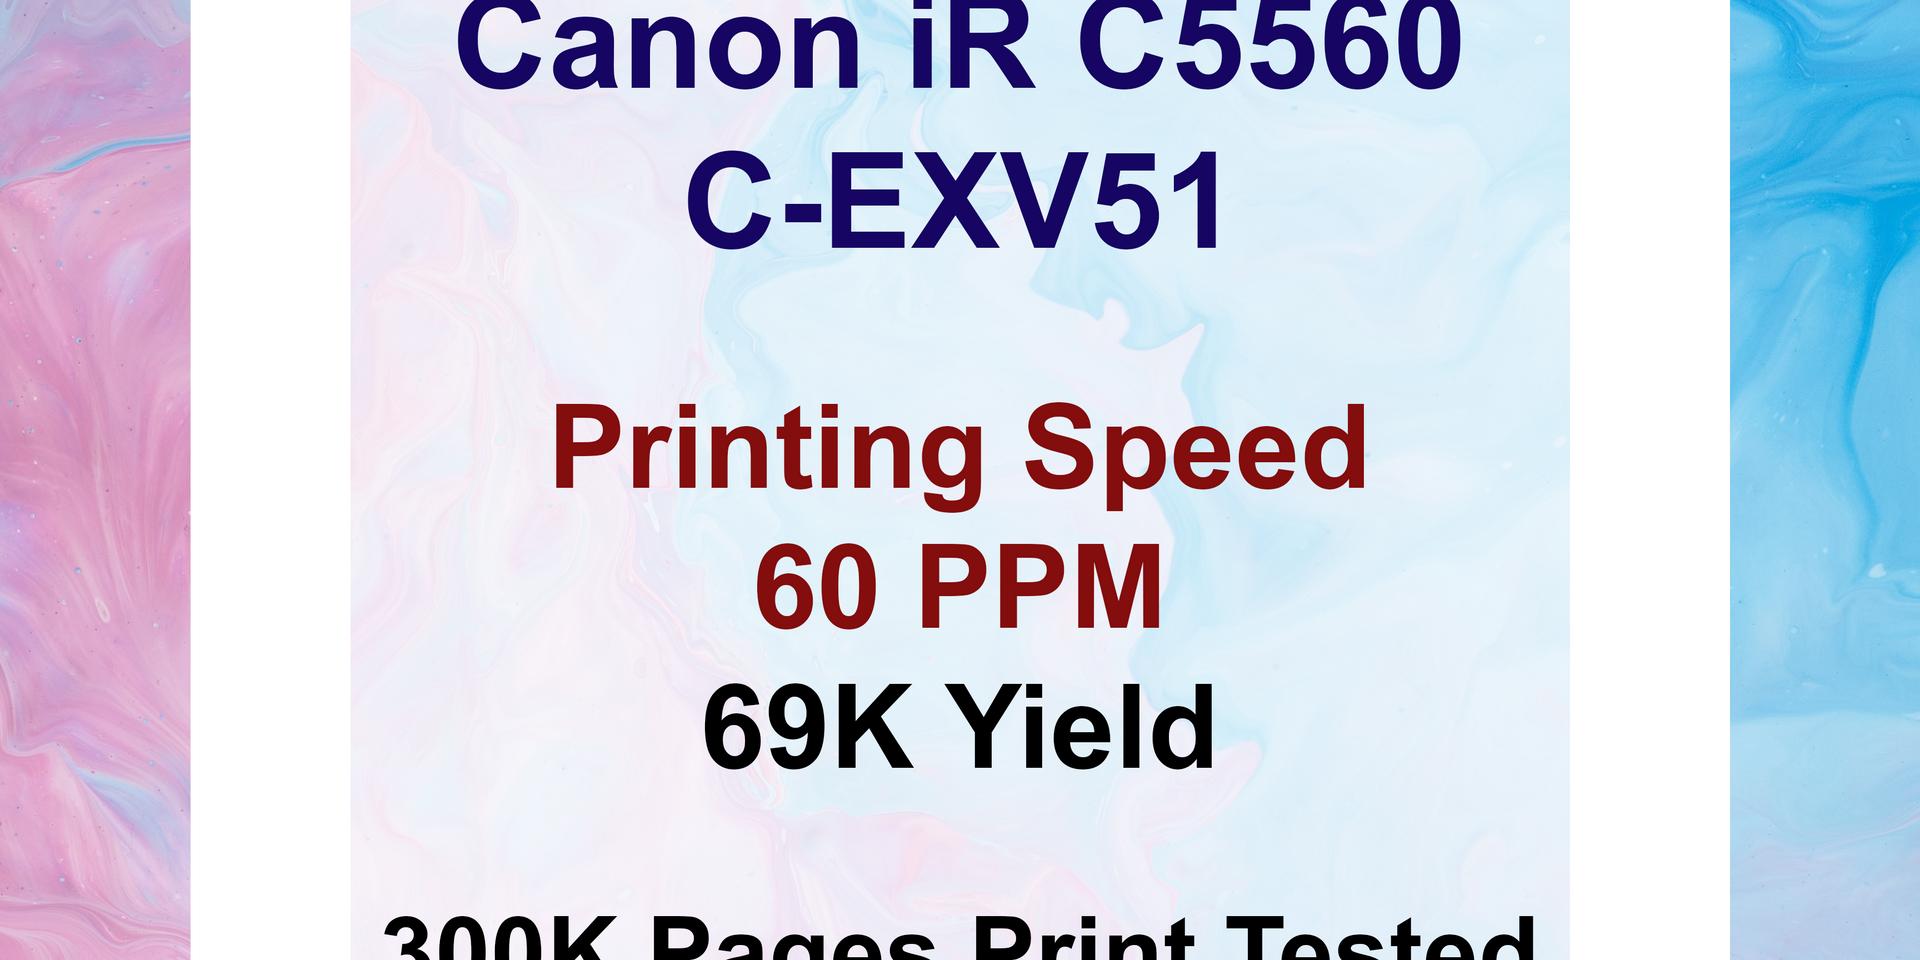 Canon IR C5560 Compatible Toner